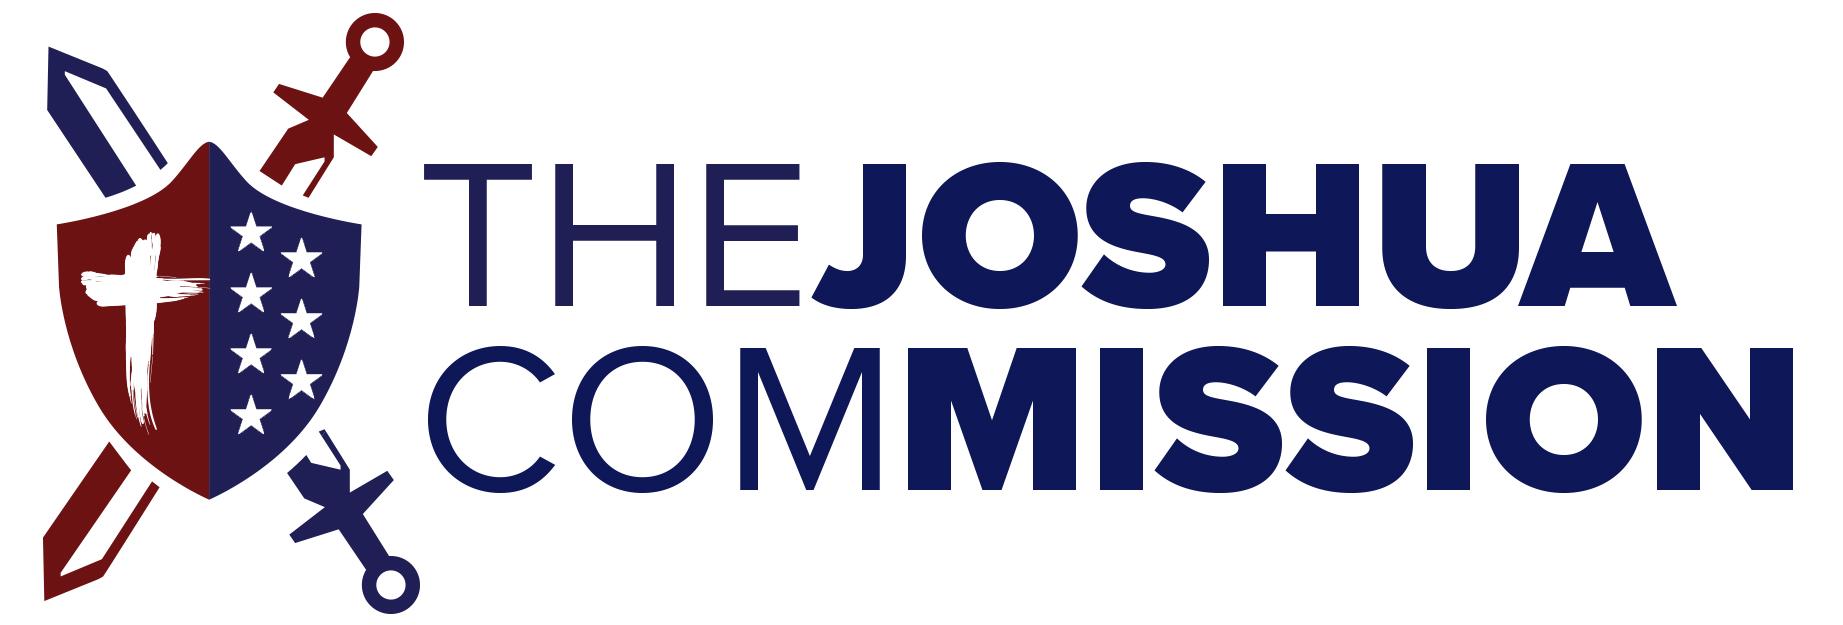 The Joshua Commission